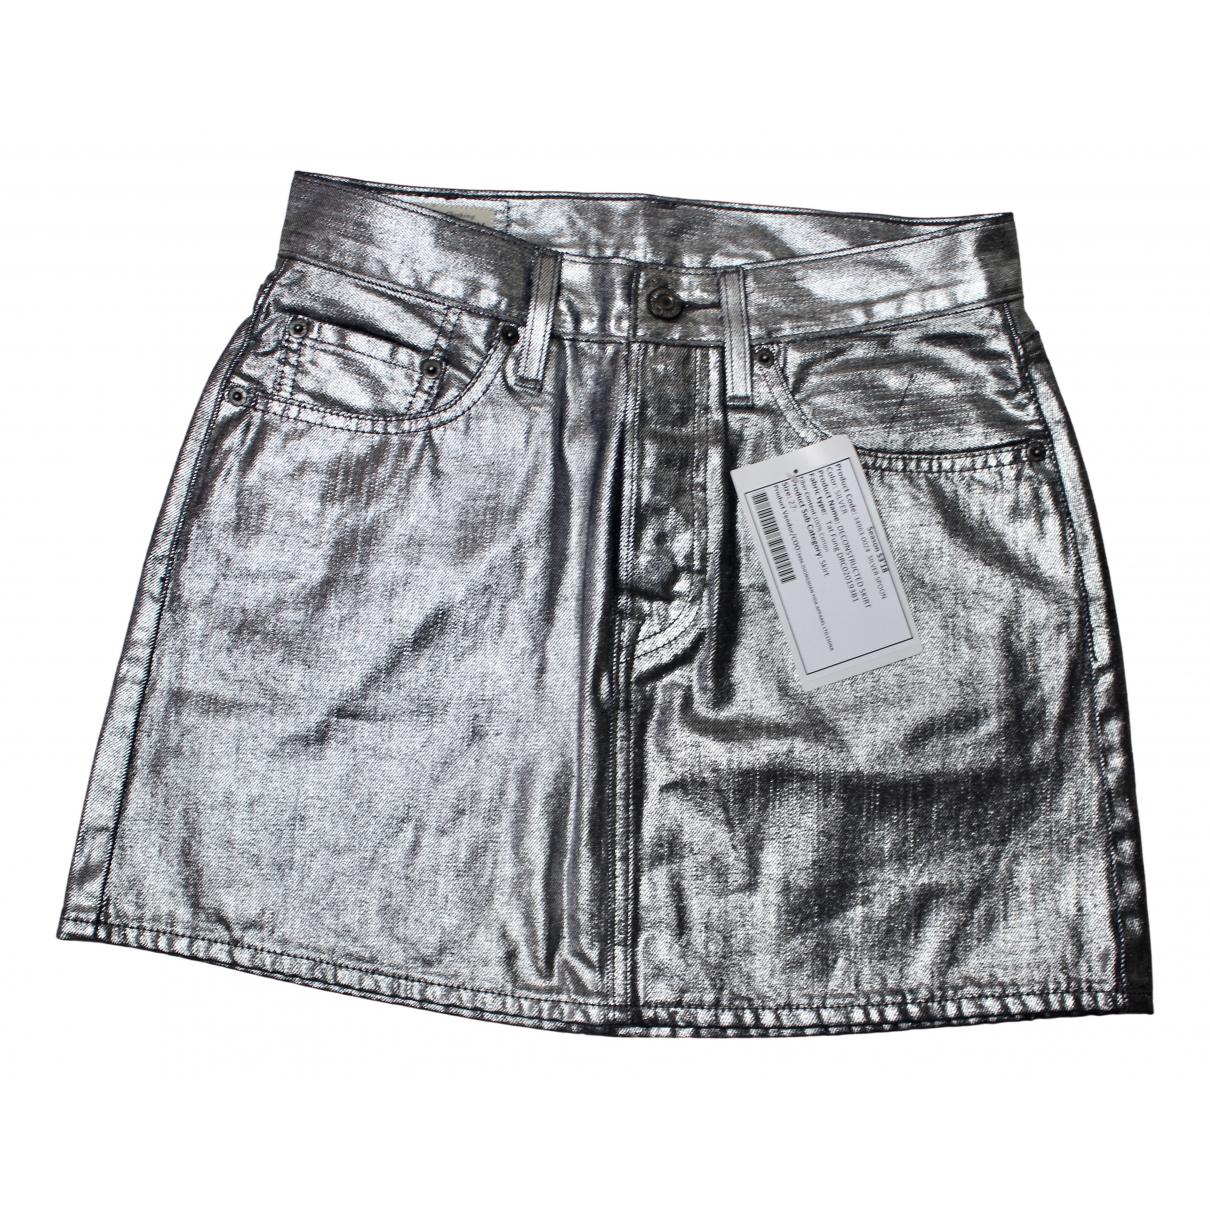 Levi's \N Silver Cotton skirt for Women M International